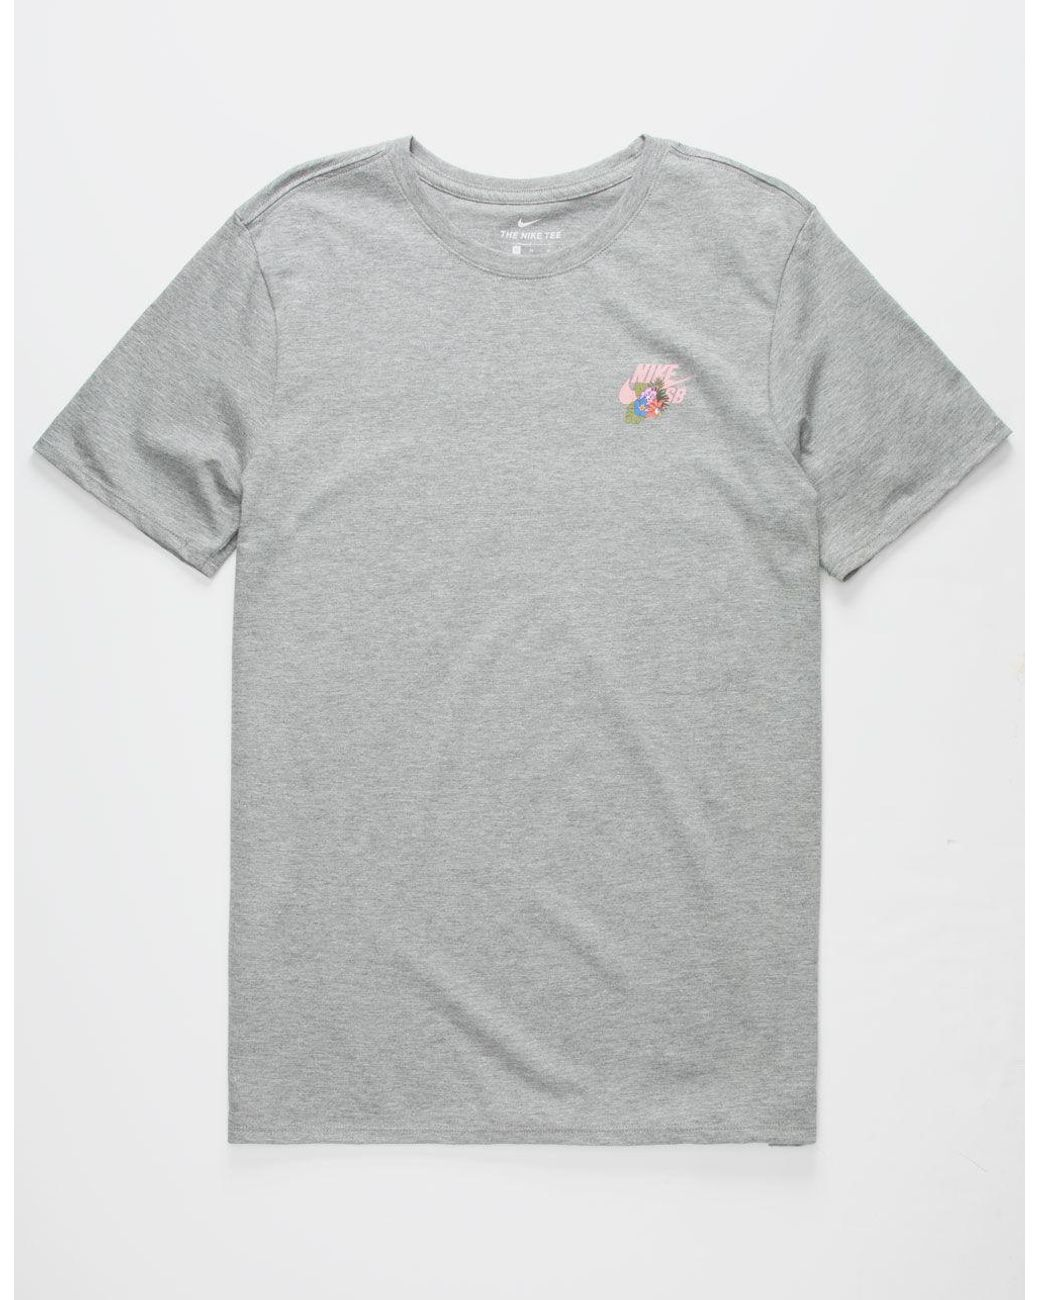 Nike Cotton Safari Floral Logo Mens T Shirt In Heather Gray Gray